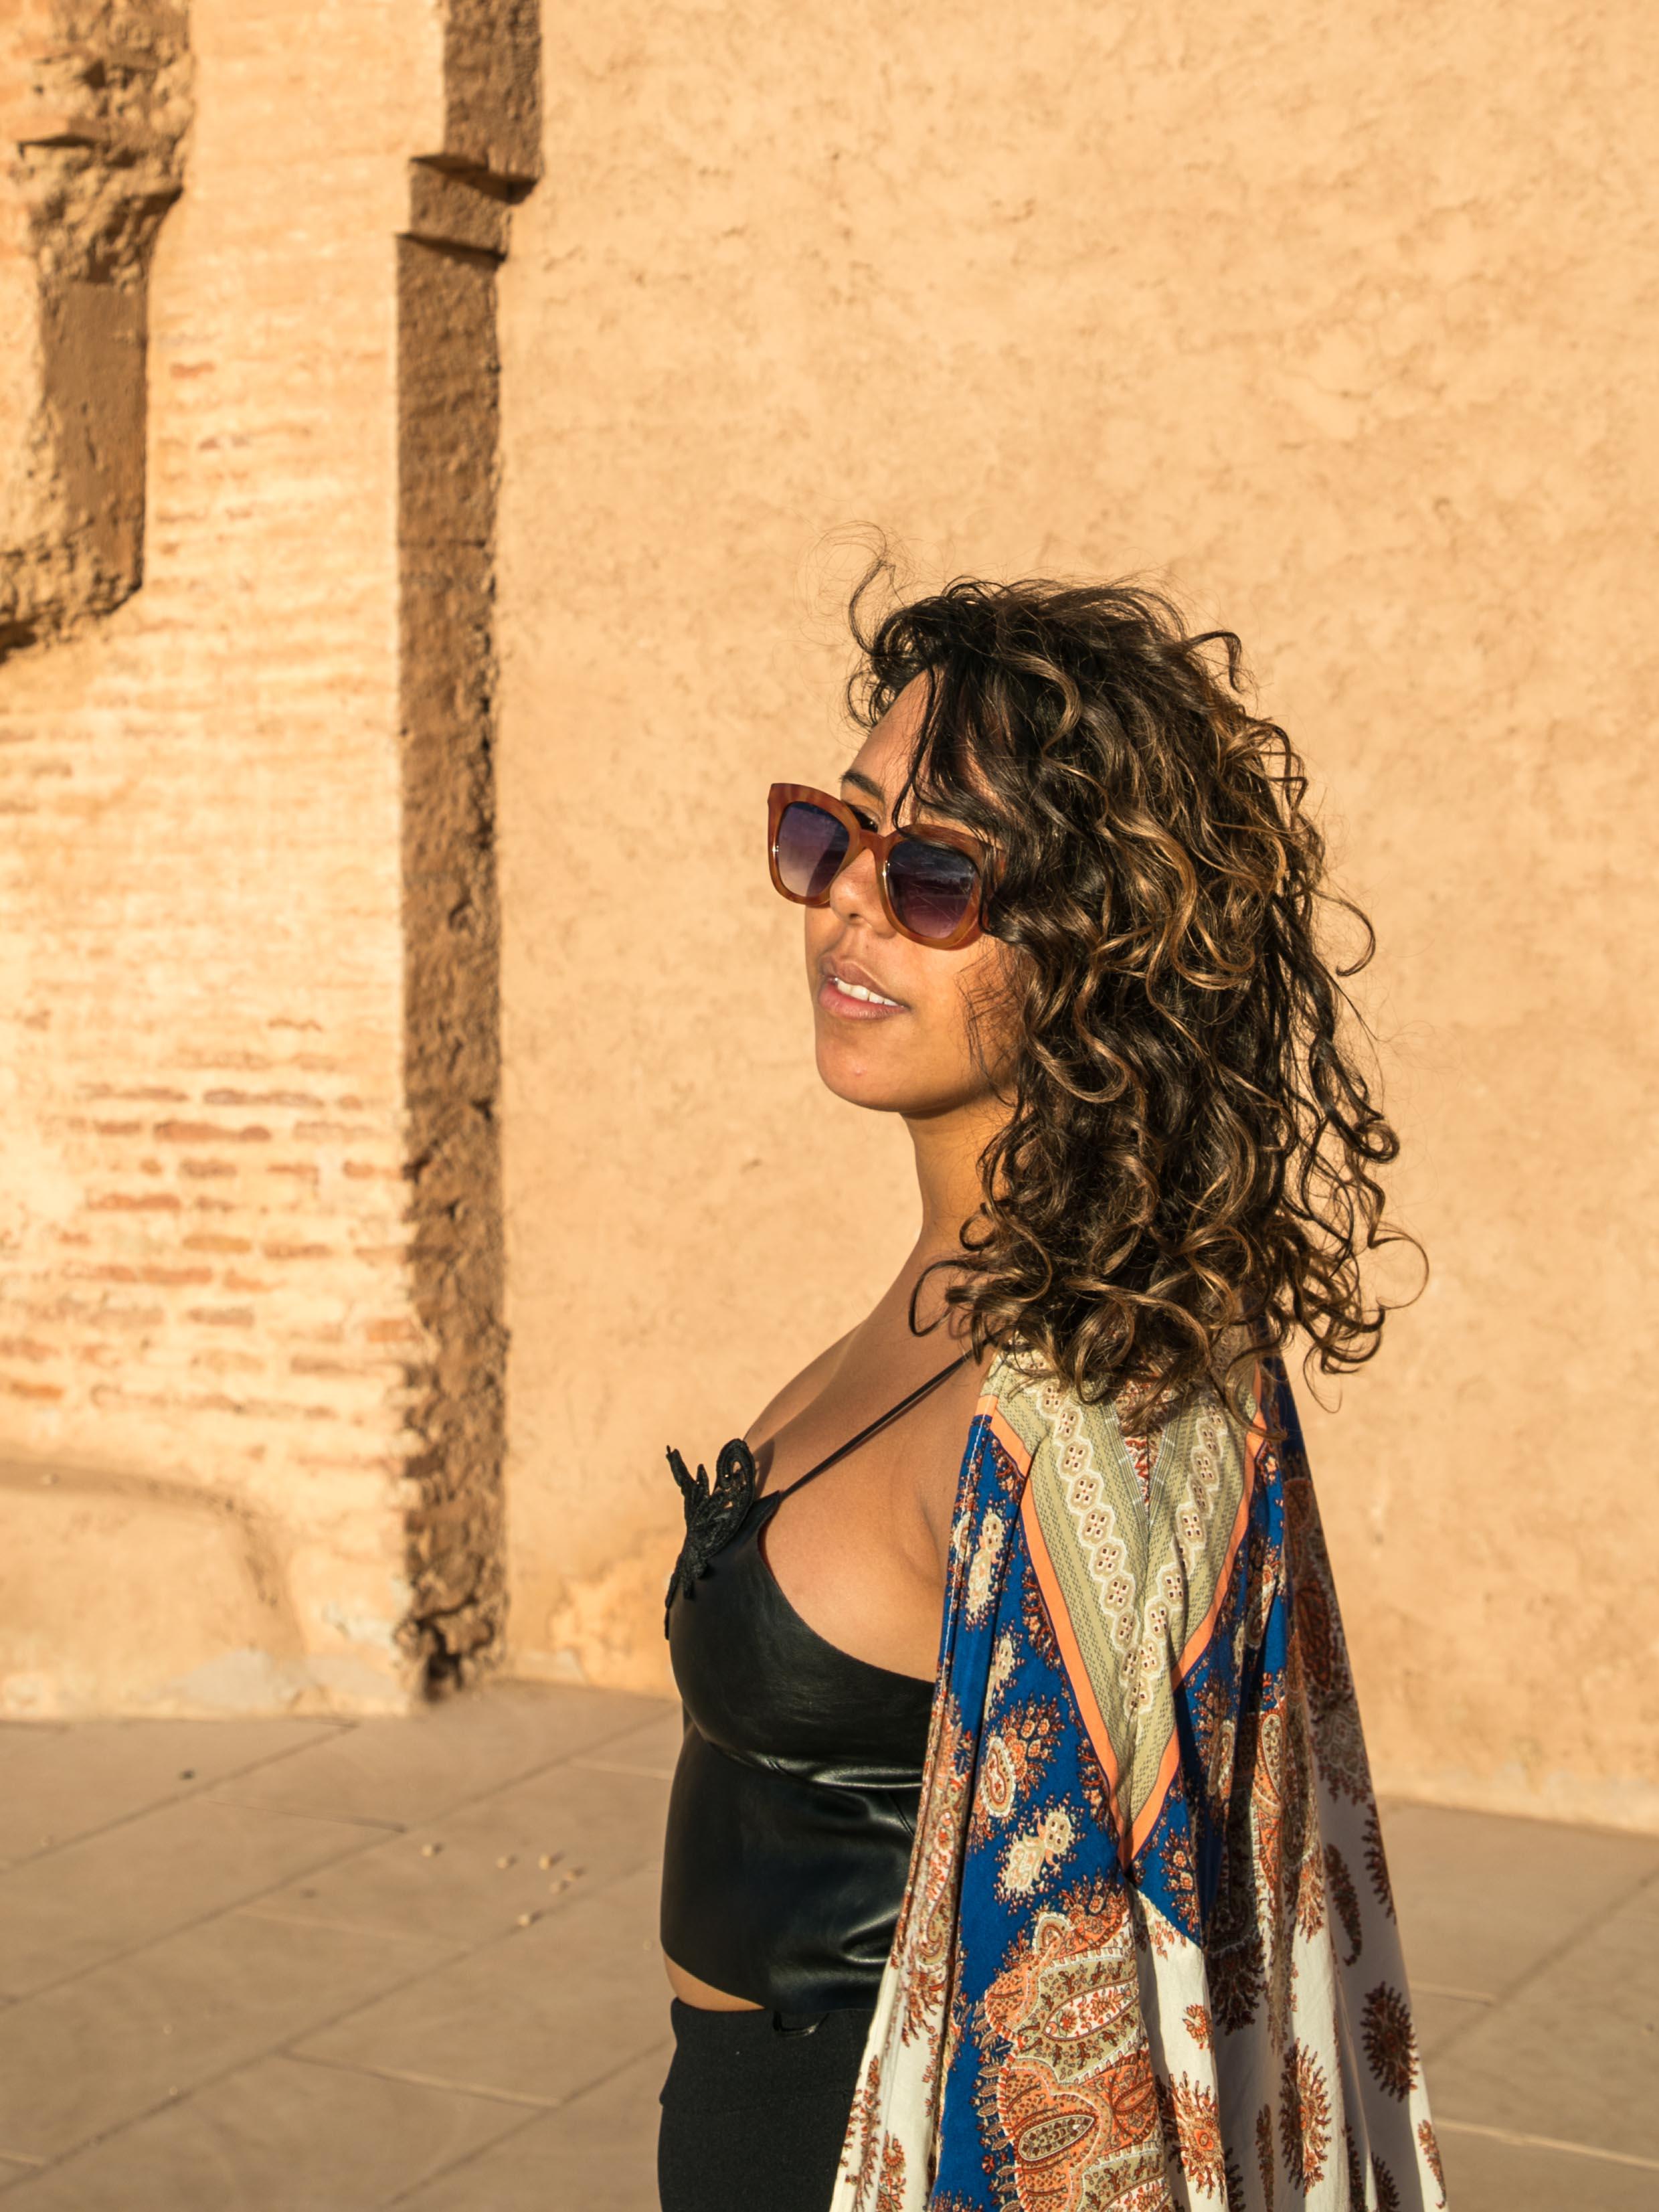 Alysha - @alyshasharonp  co-organized #honeysinmarrakech